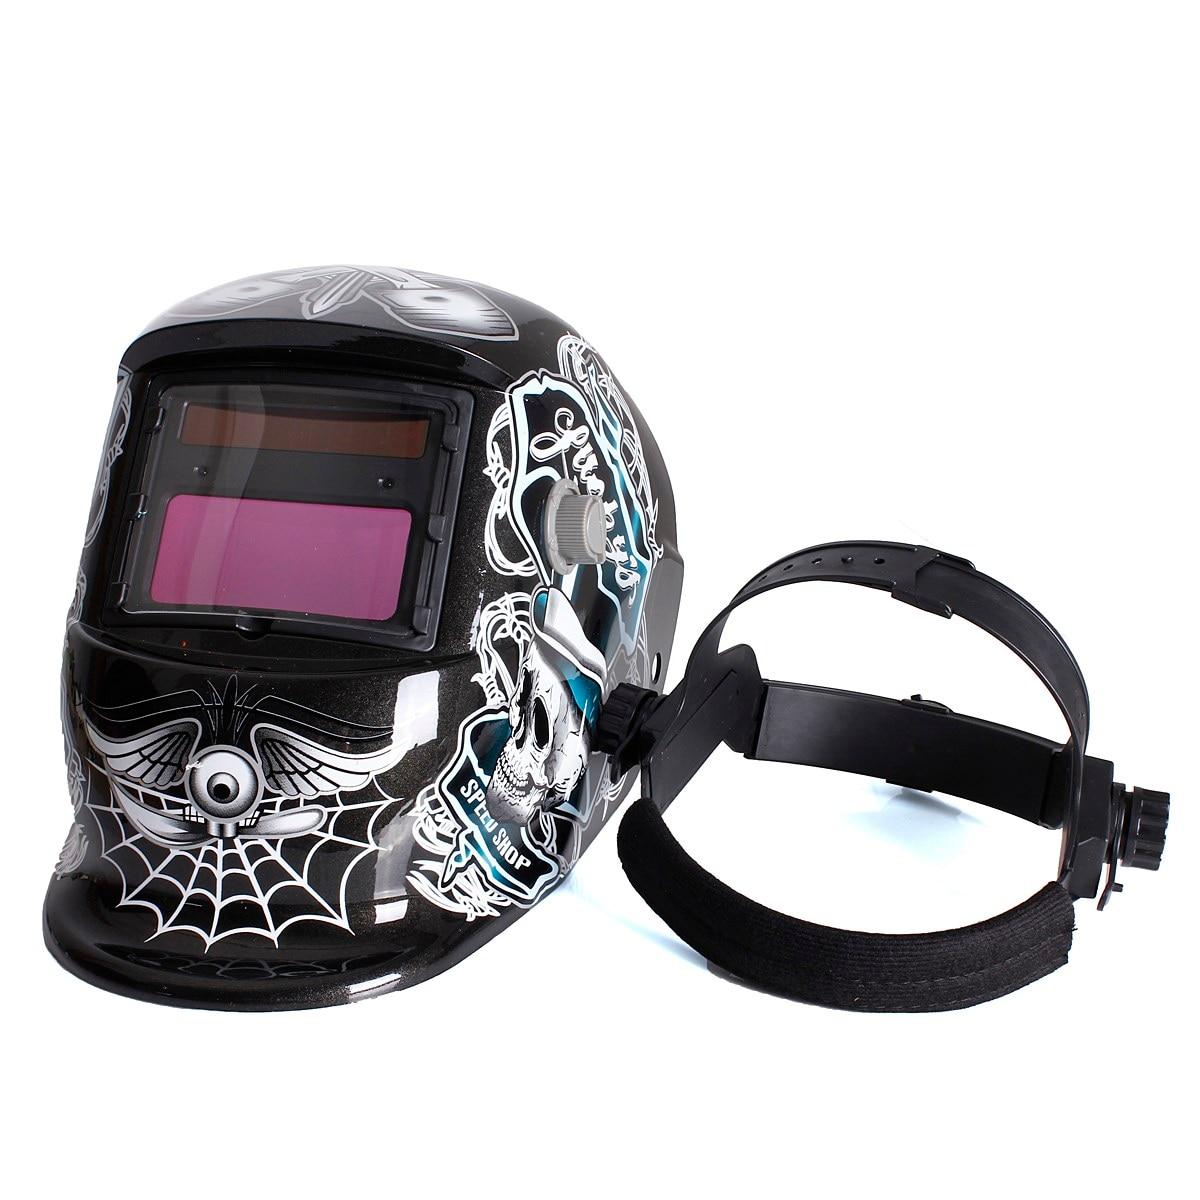 Hot Durable Solar Auto Darkening Welding Helmet ARC TIG MIG Weld For Welder Lens Grinding Mask High Quality jackson pearce sisters red